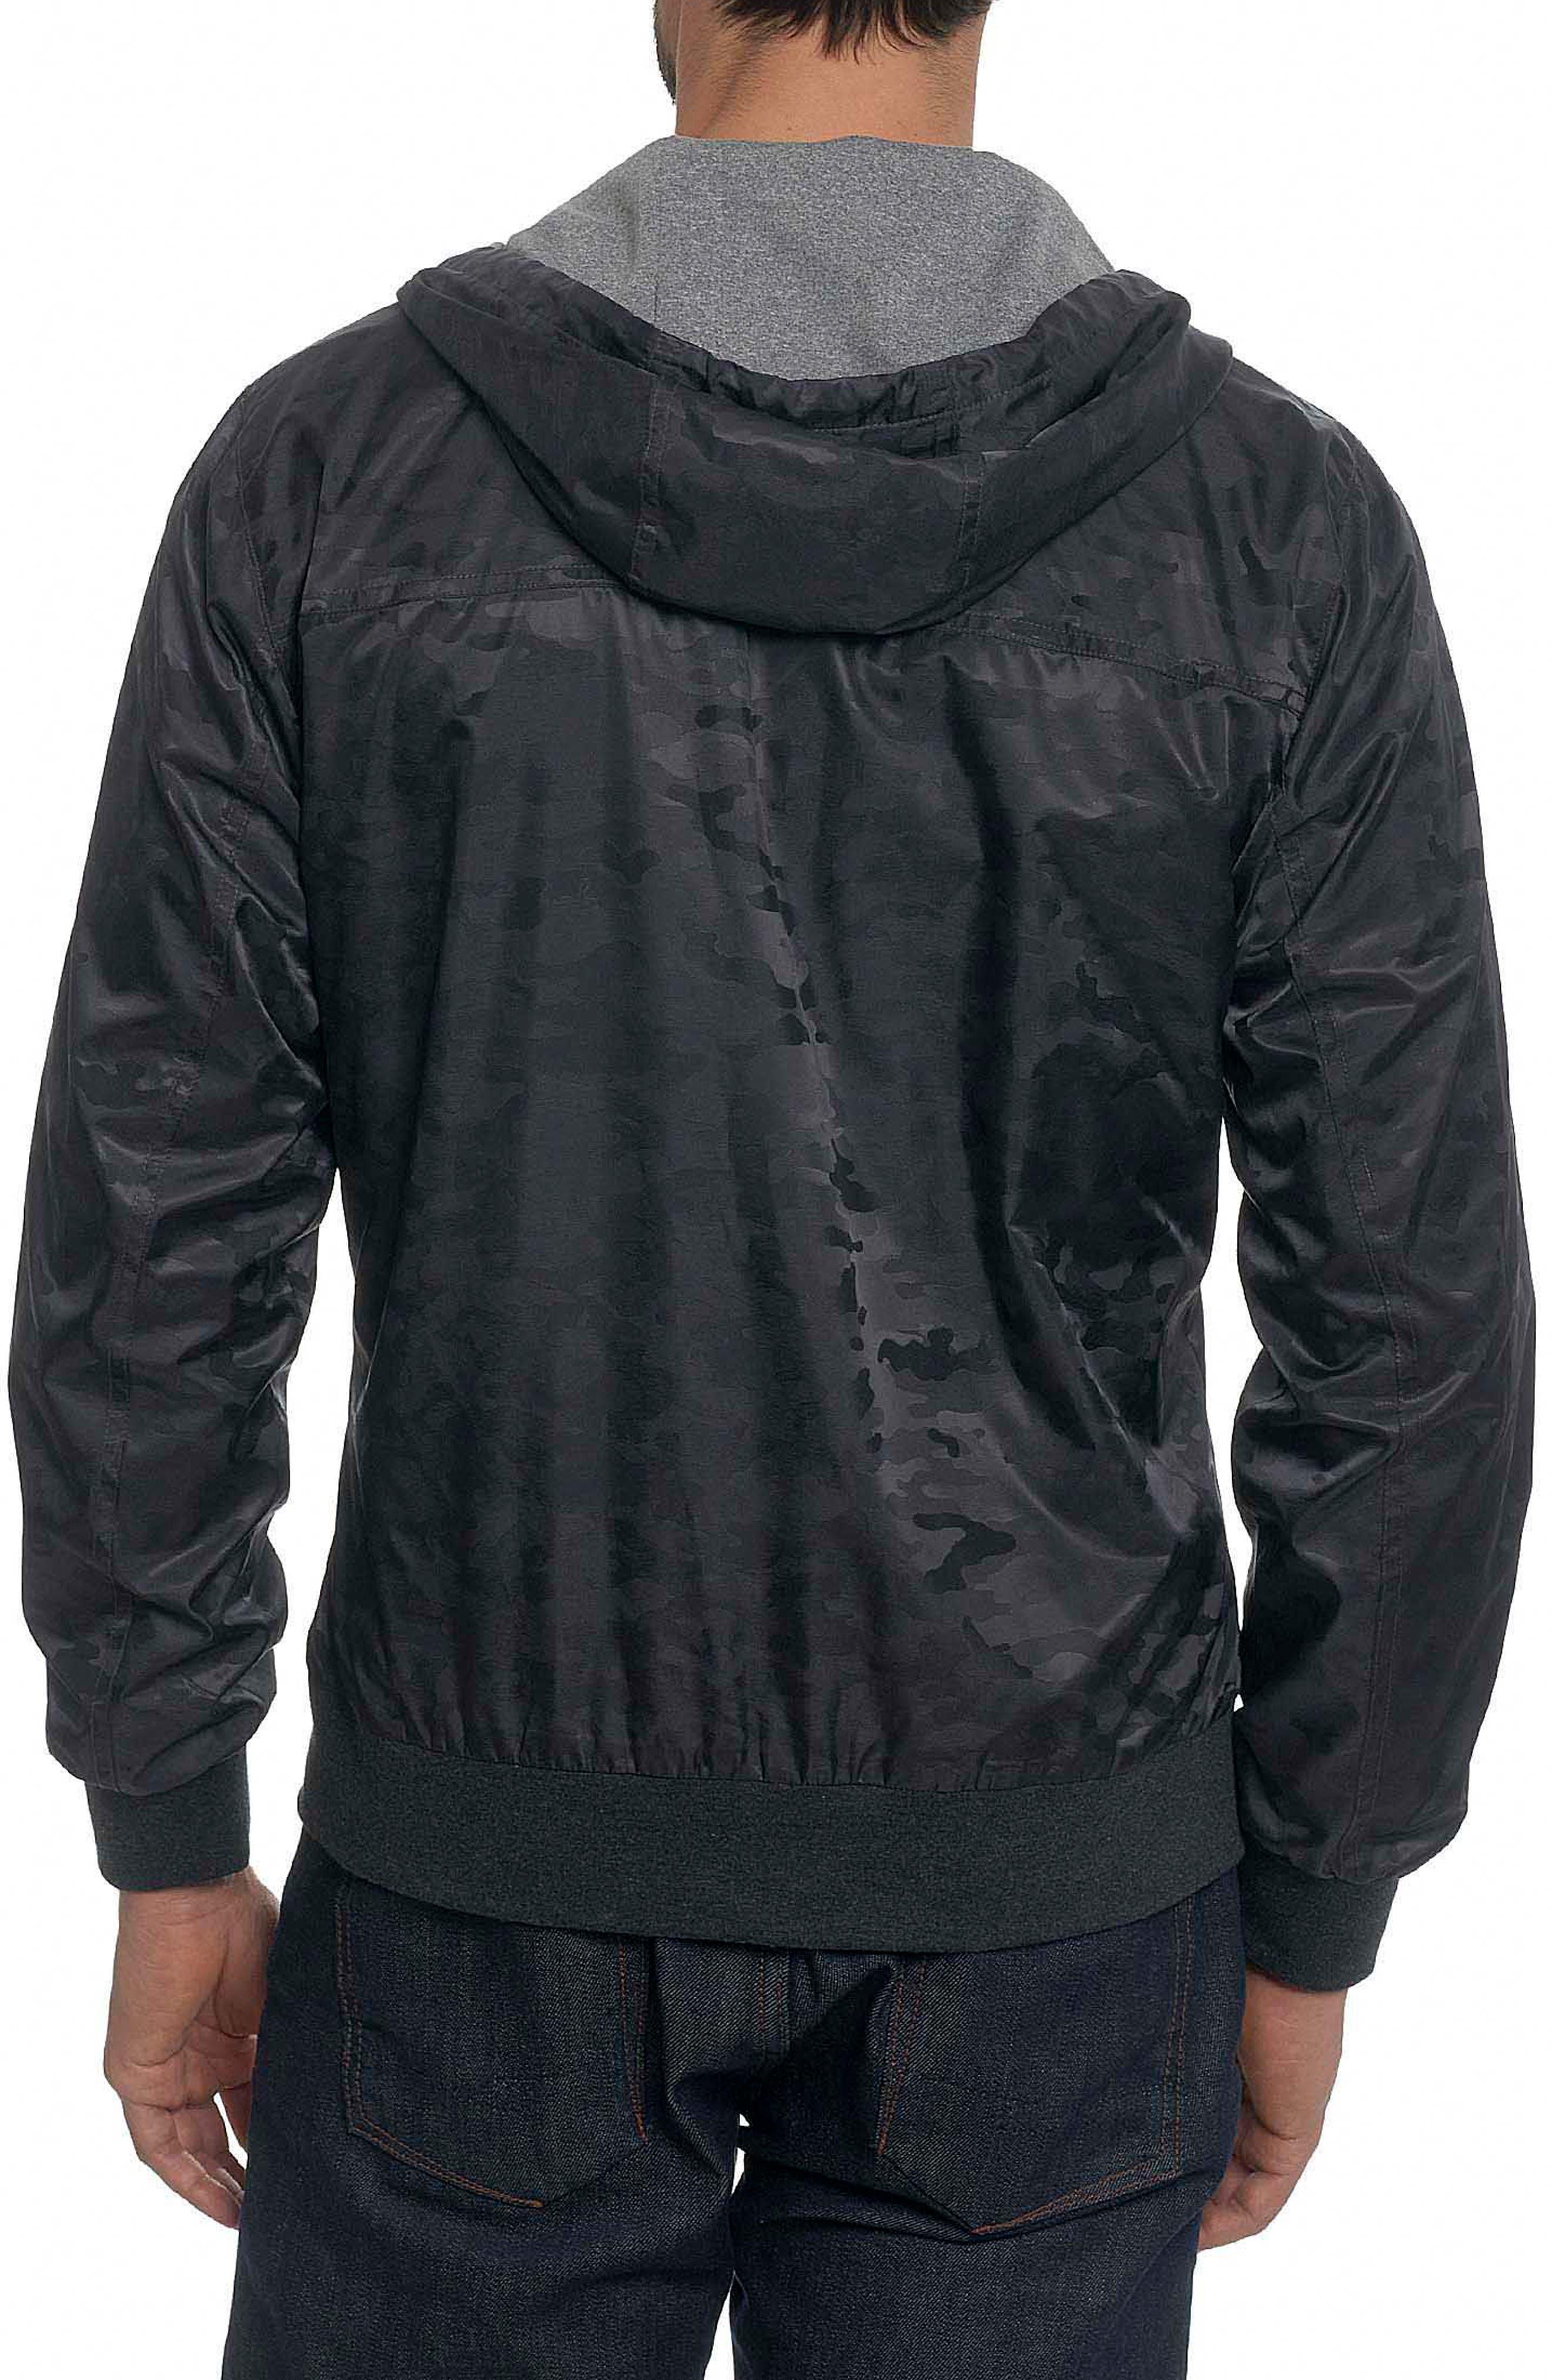 Peekskill Tailored Fit Jacket,                             Alternate thumbnail 2, color,                             Carbon